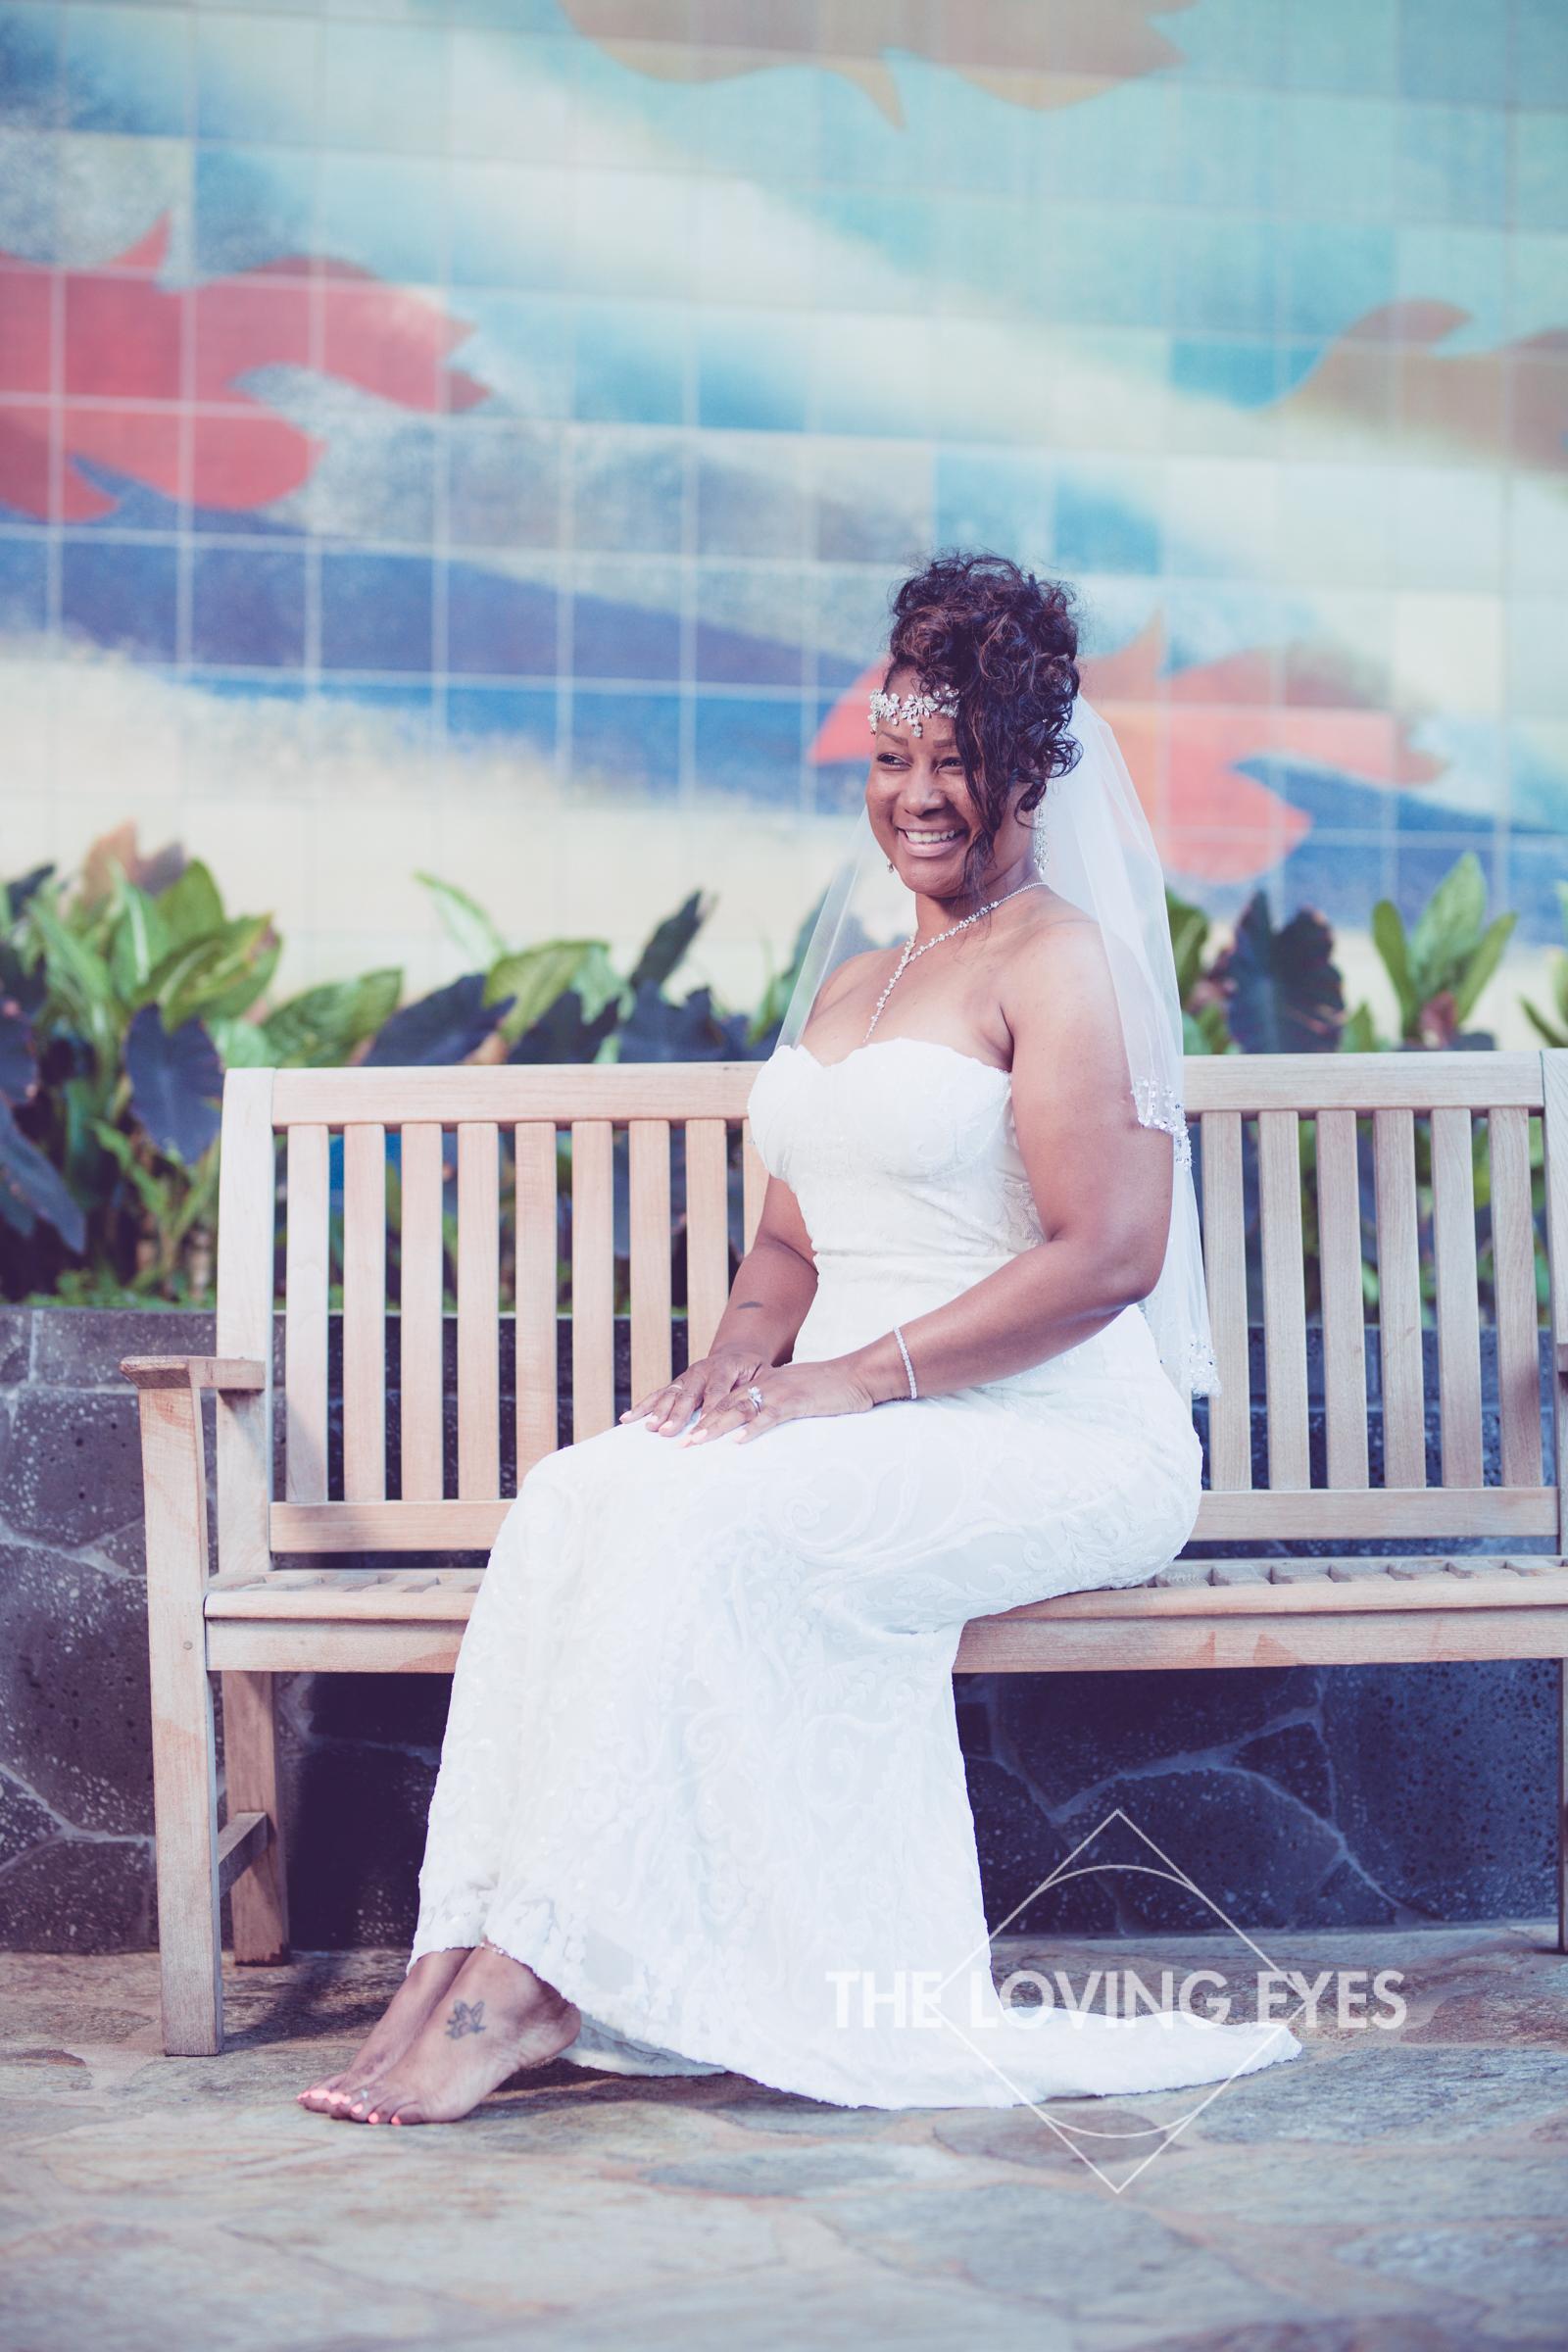 Honeymoon-Photos-in-Waikiki-2.jpg